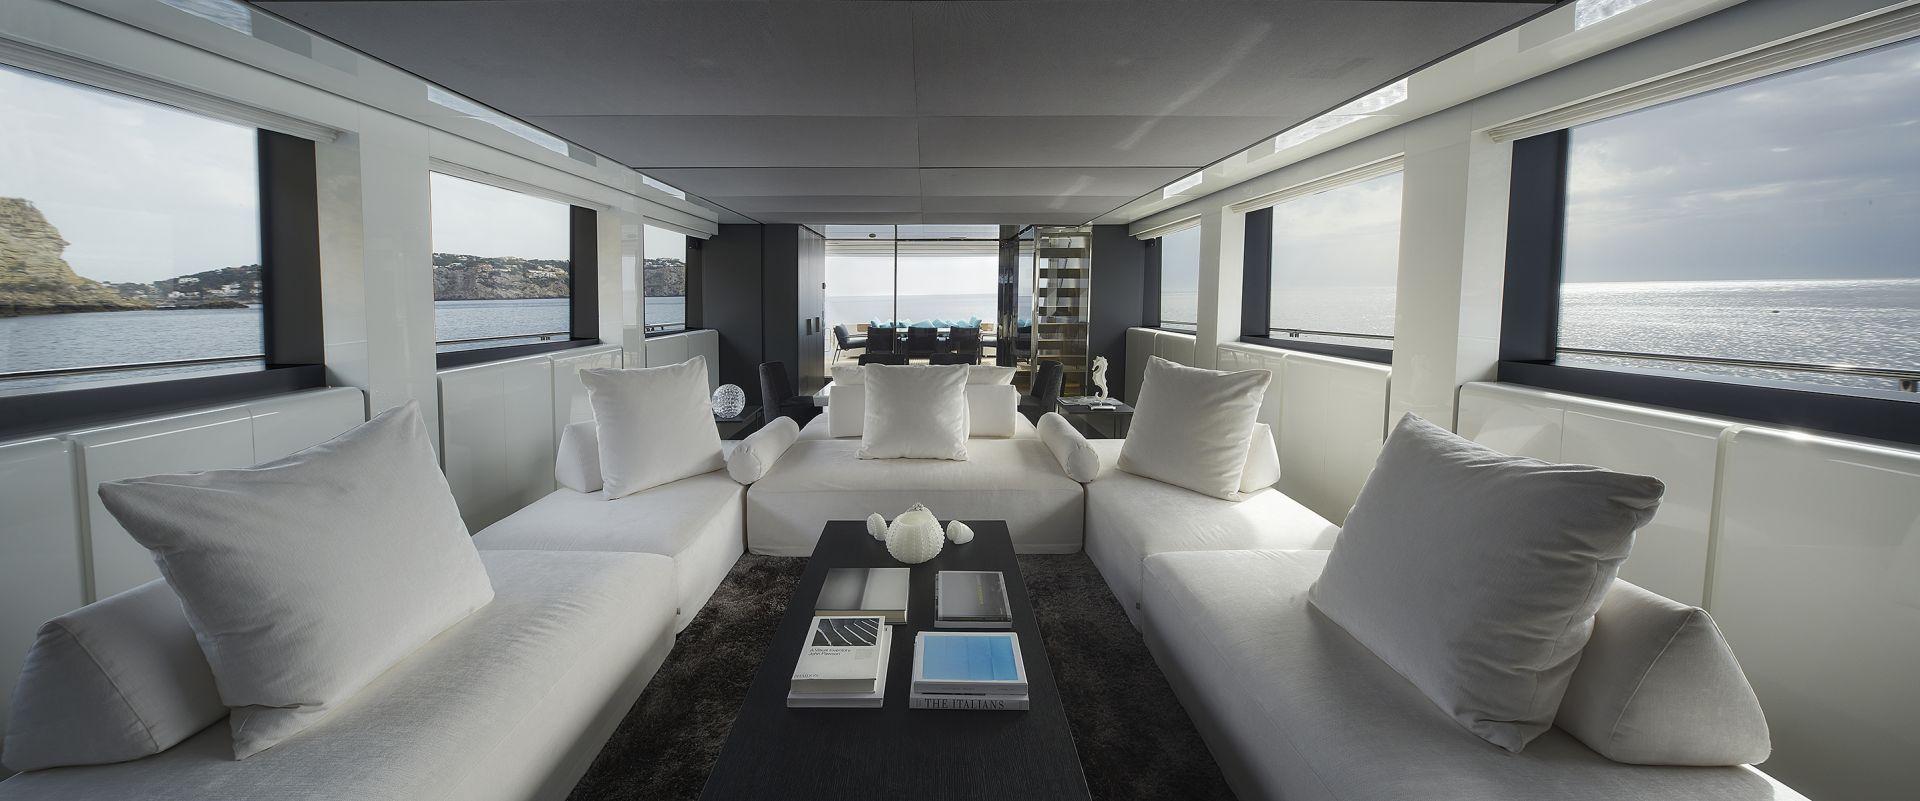 Sanlorenzo Yacht 2 - image 1